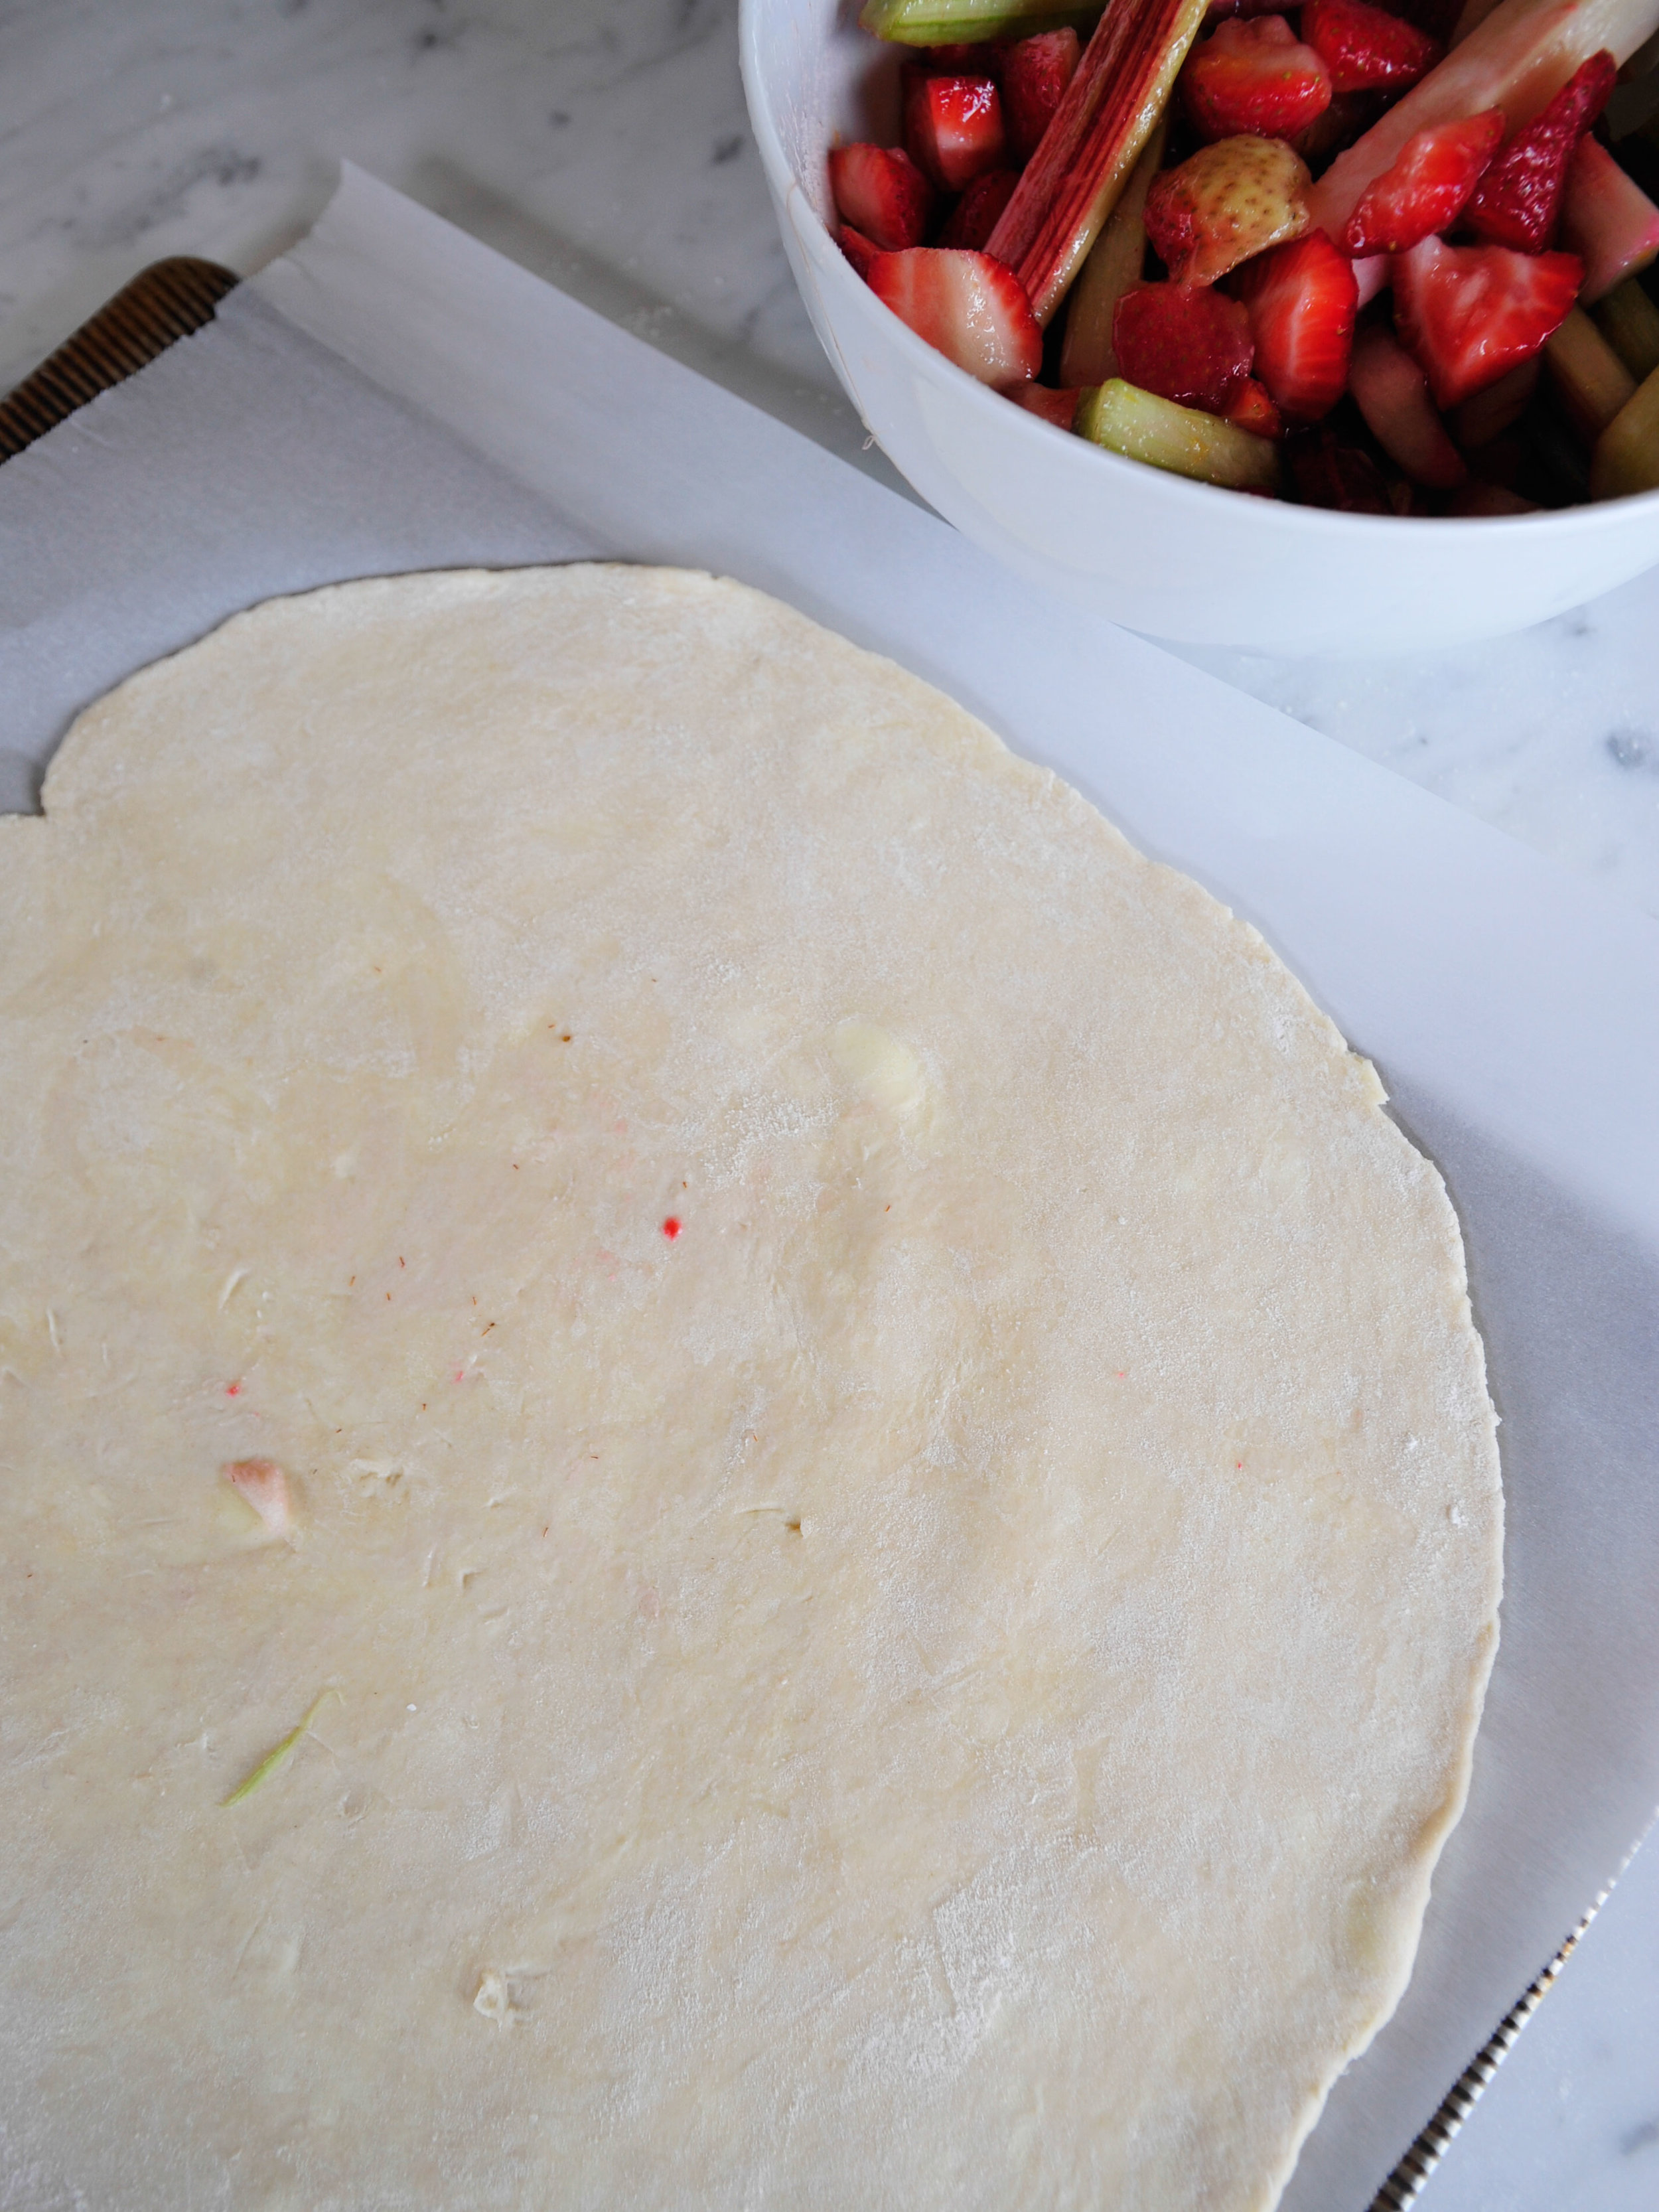 bowtiebaking-strawberry-rhubarb-galette-4.jpg